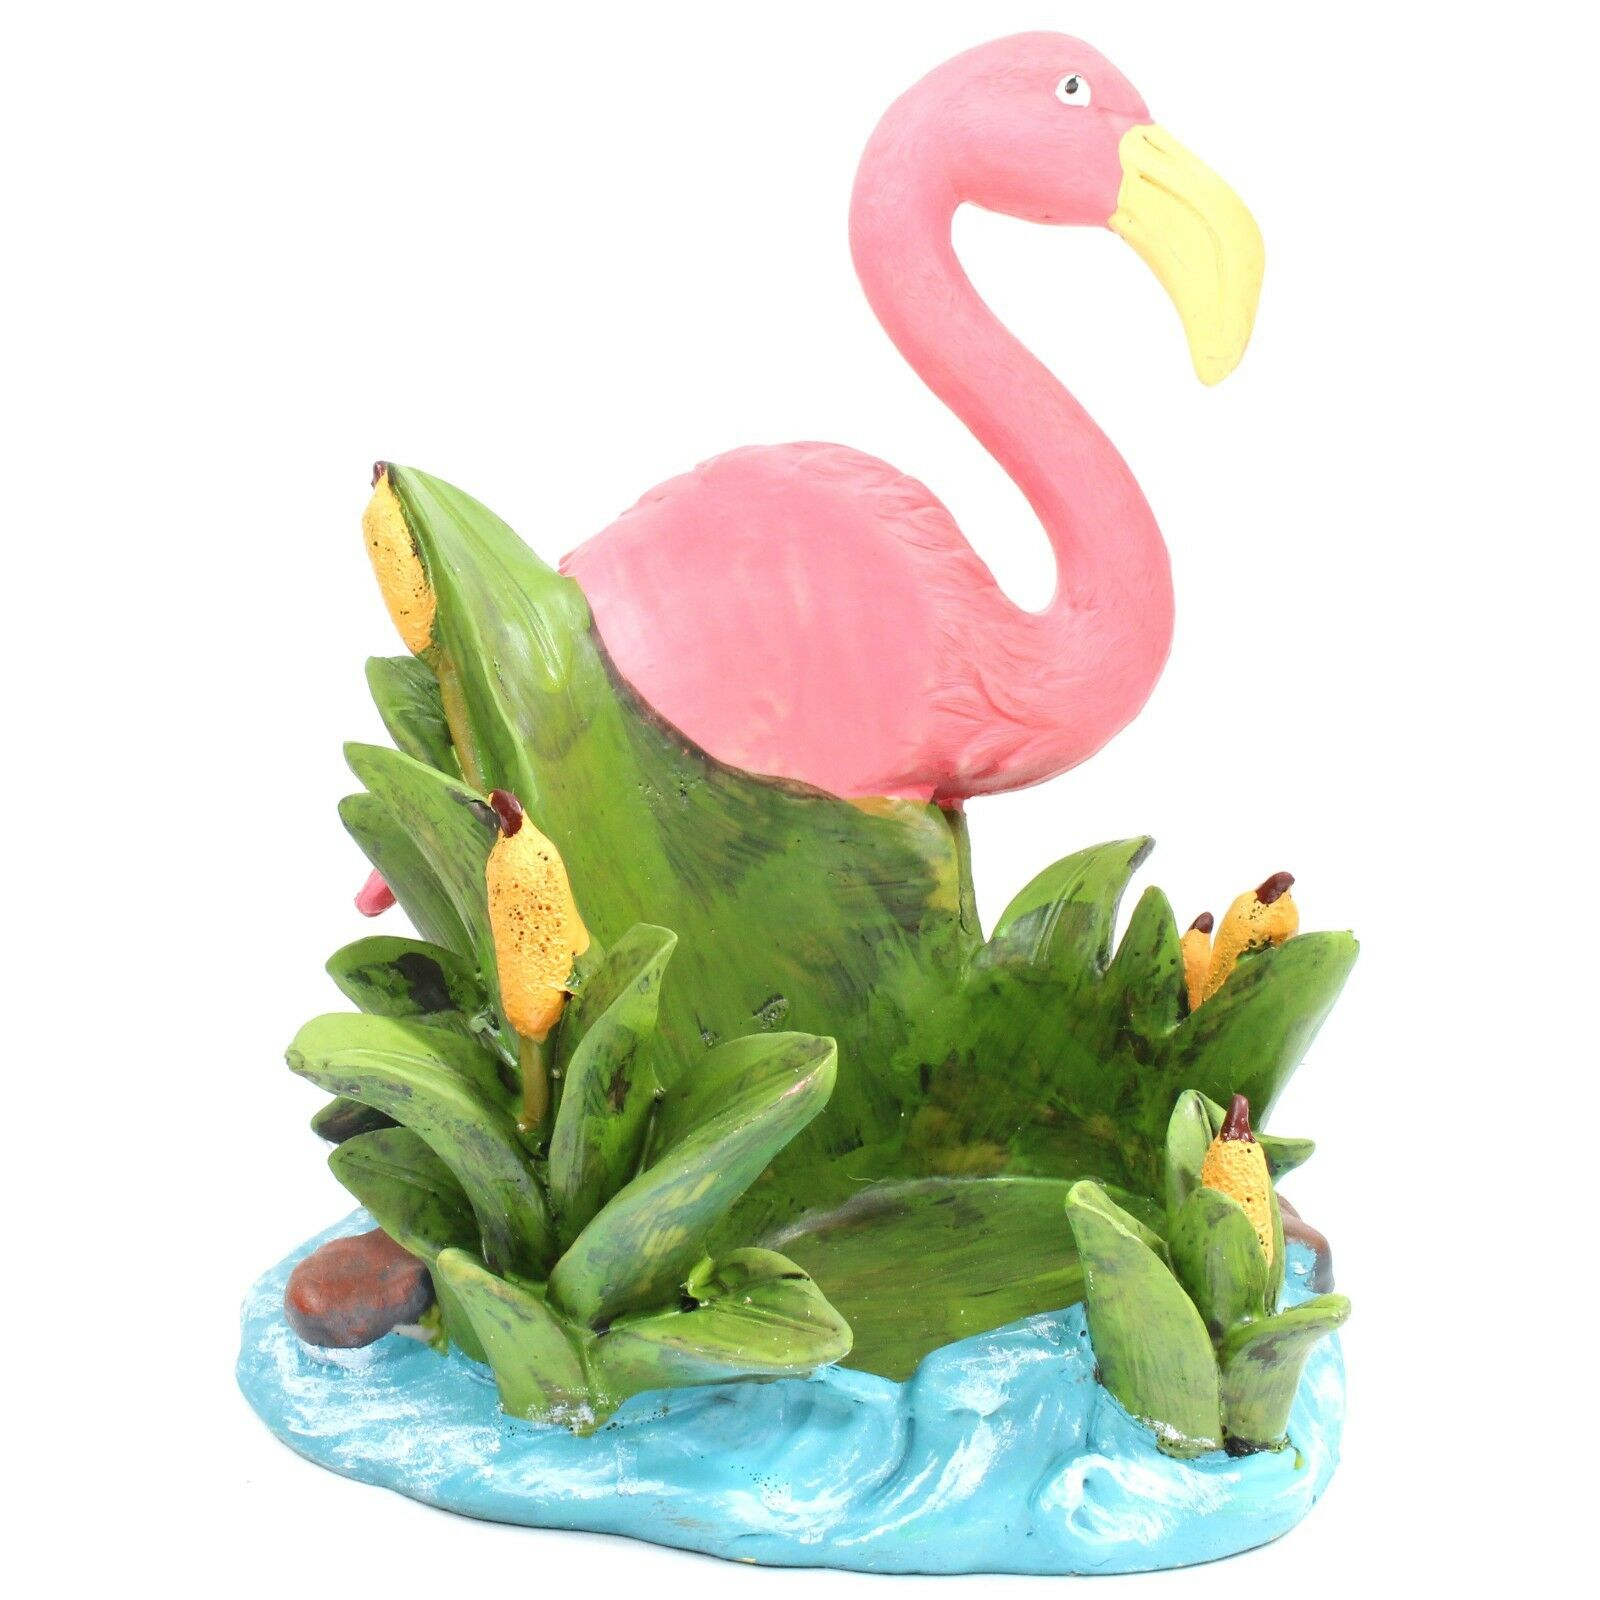 Flamingo Wine Bottle Holder - Wine Accessories - Tropical Tropical Tropical - Flamingo -WW-1227 ba7888